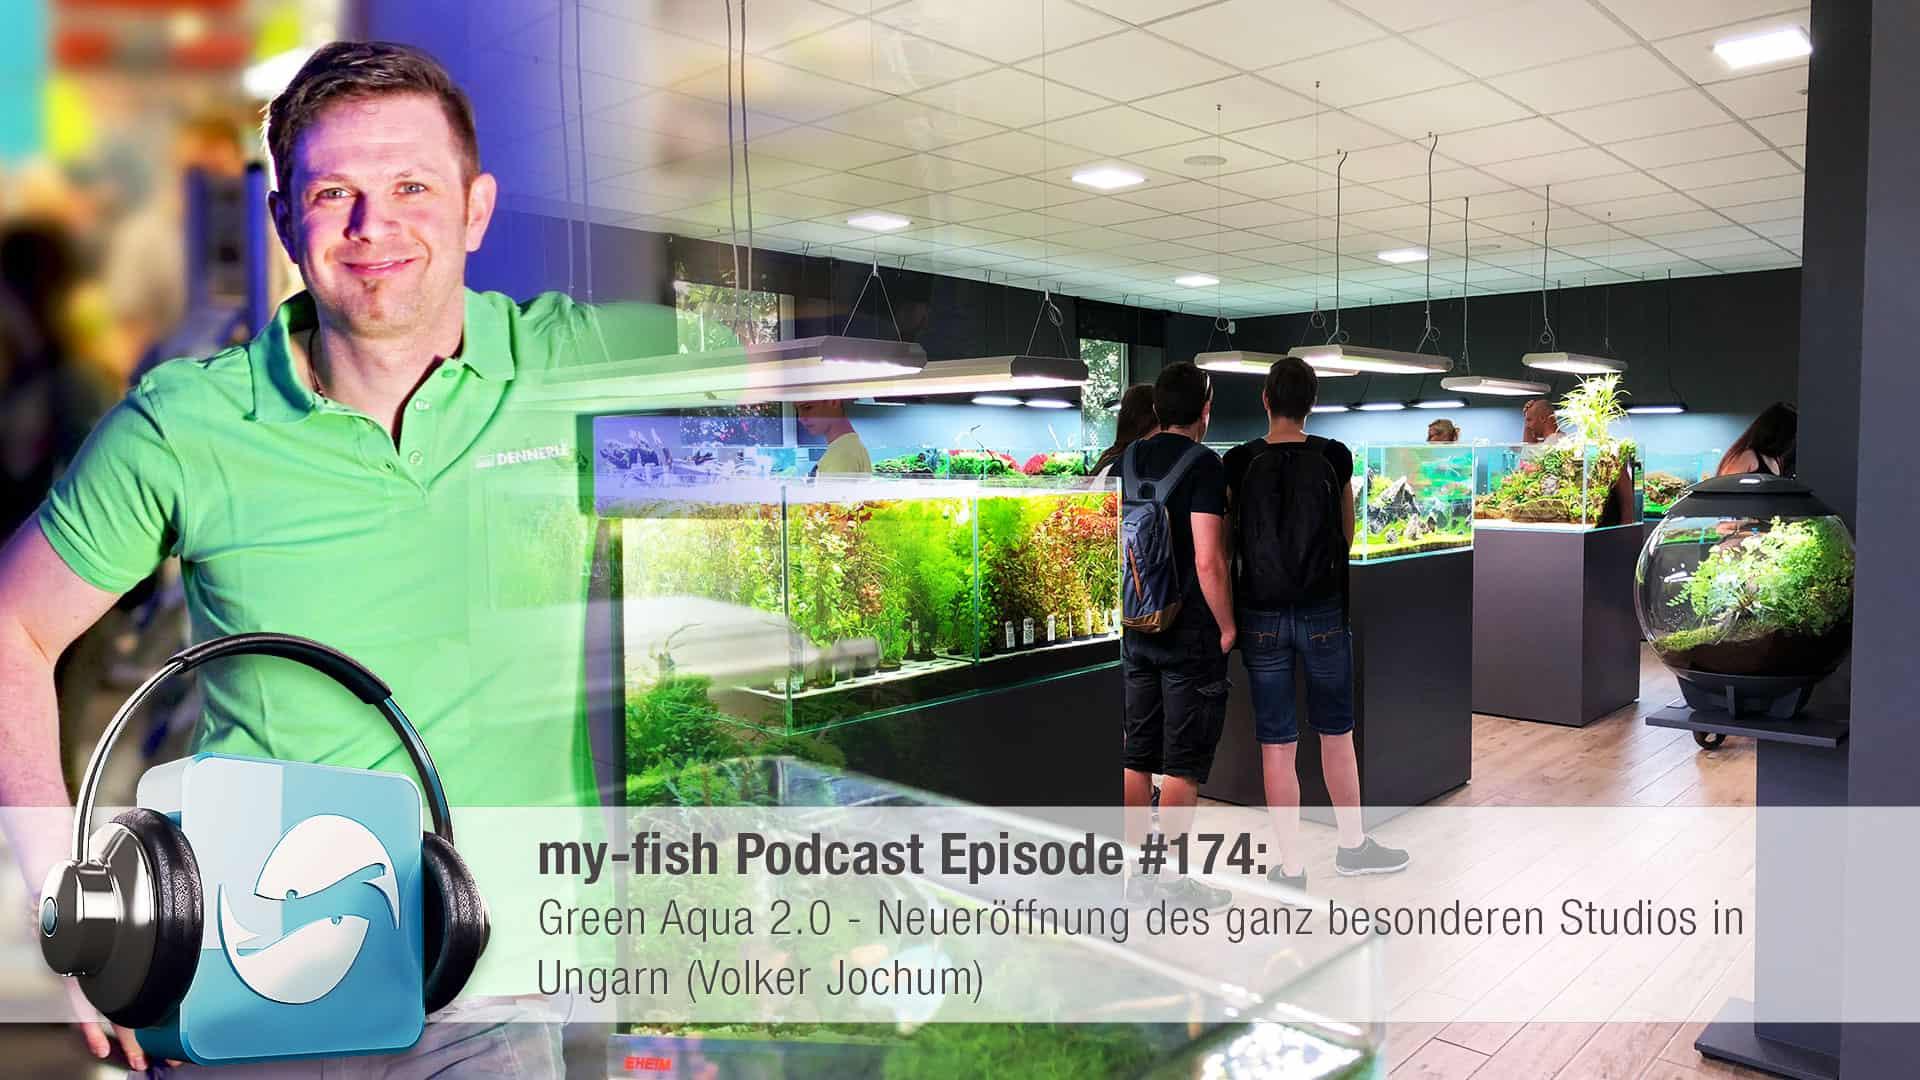 Podcast Episode #174: Green Aqua 2.0 - Neueröffnung des ganz besonderen Studios in Ungarn (Volker Jochum) 1